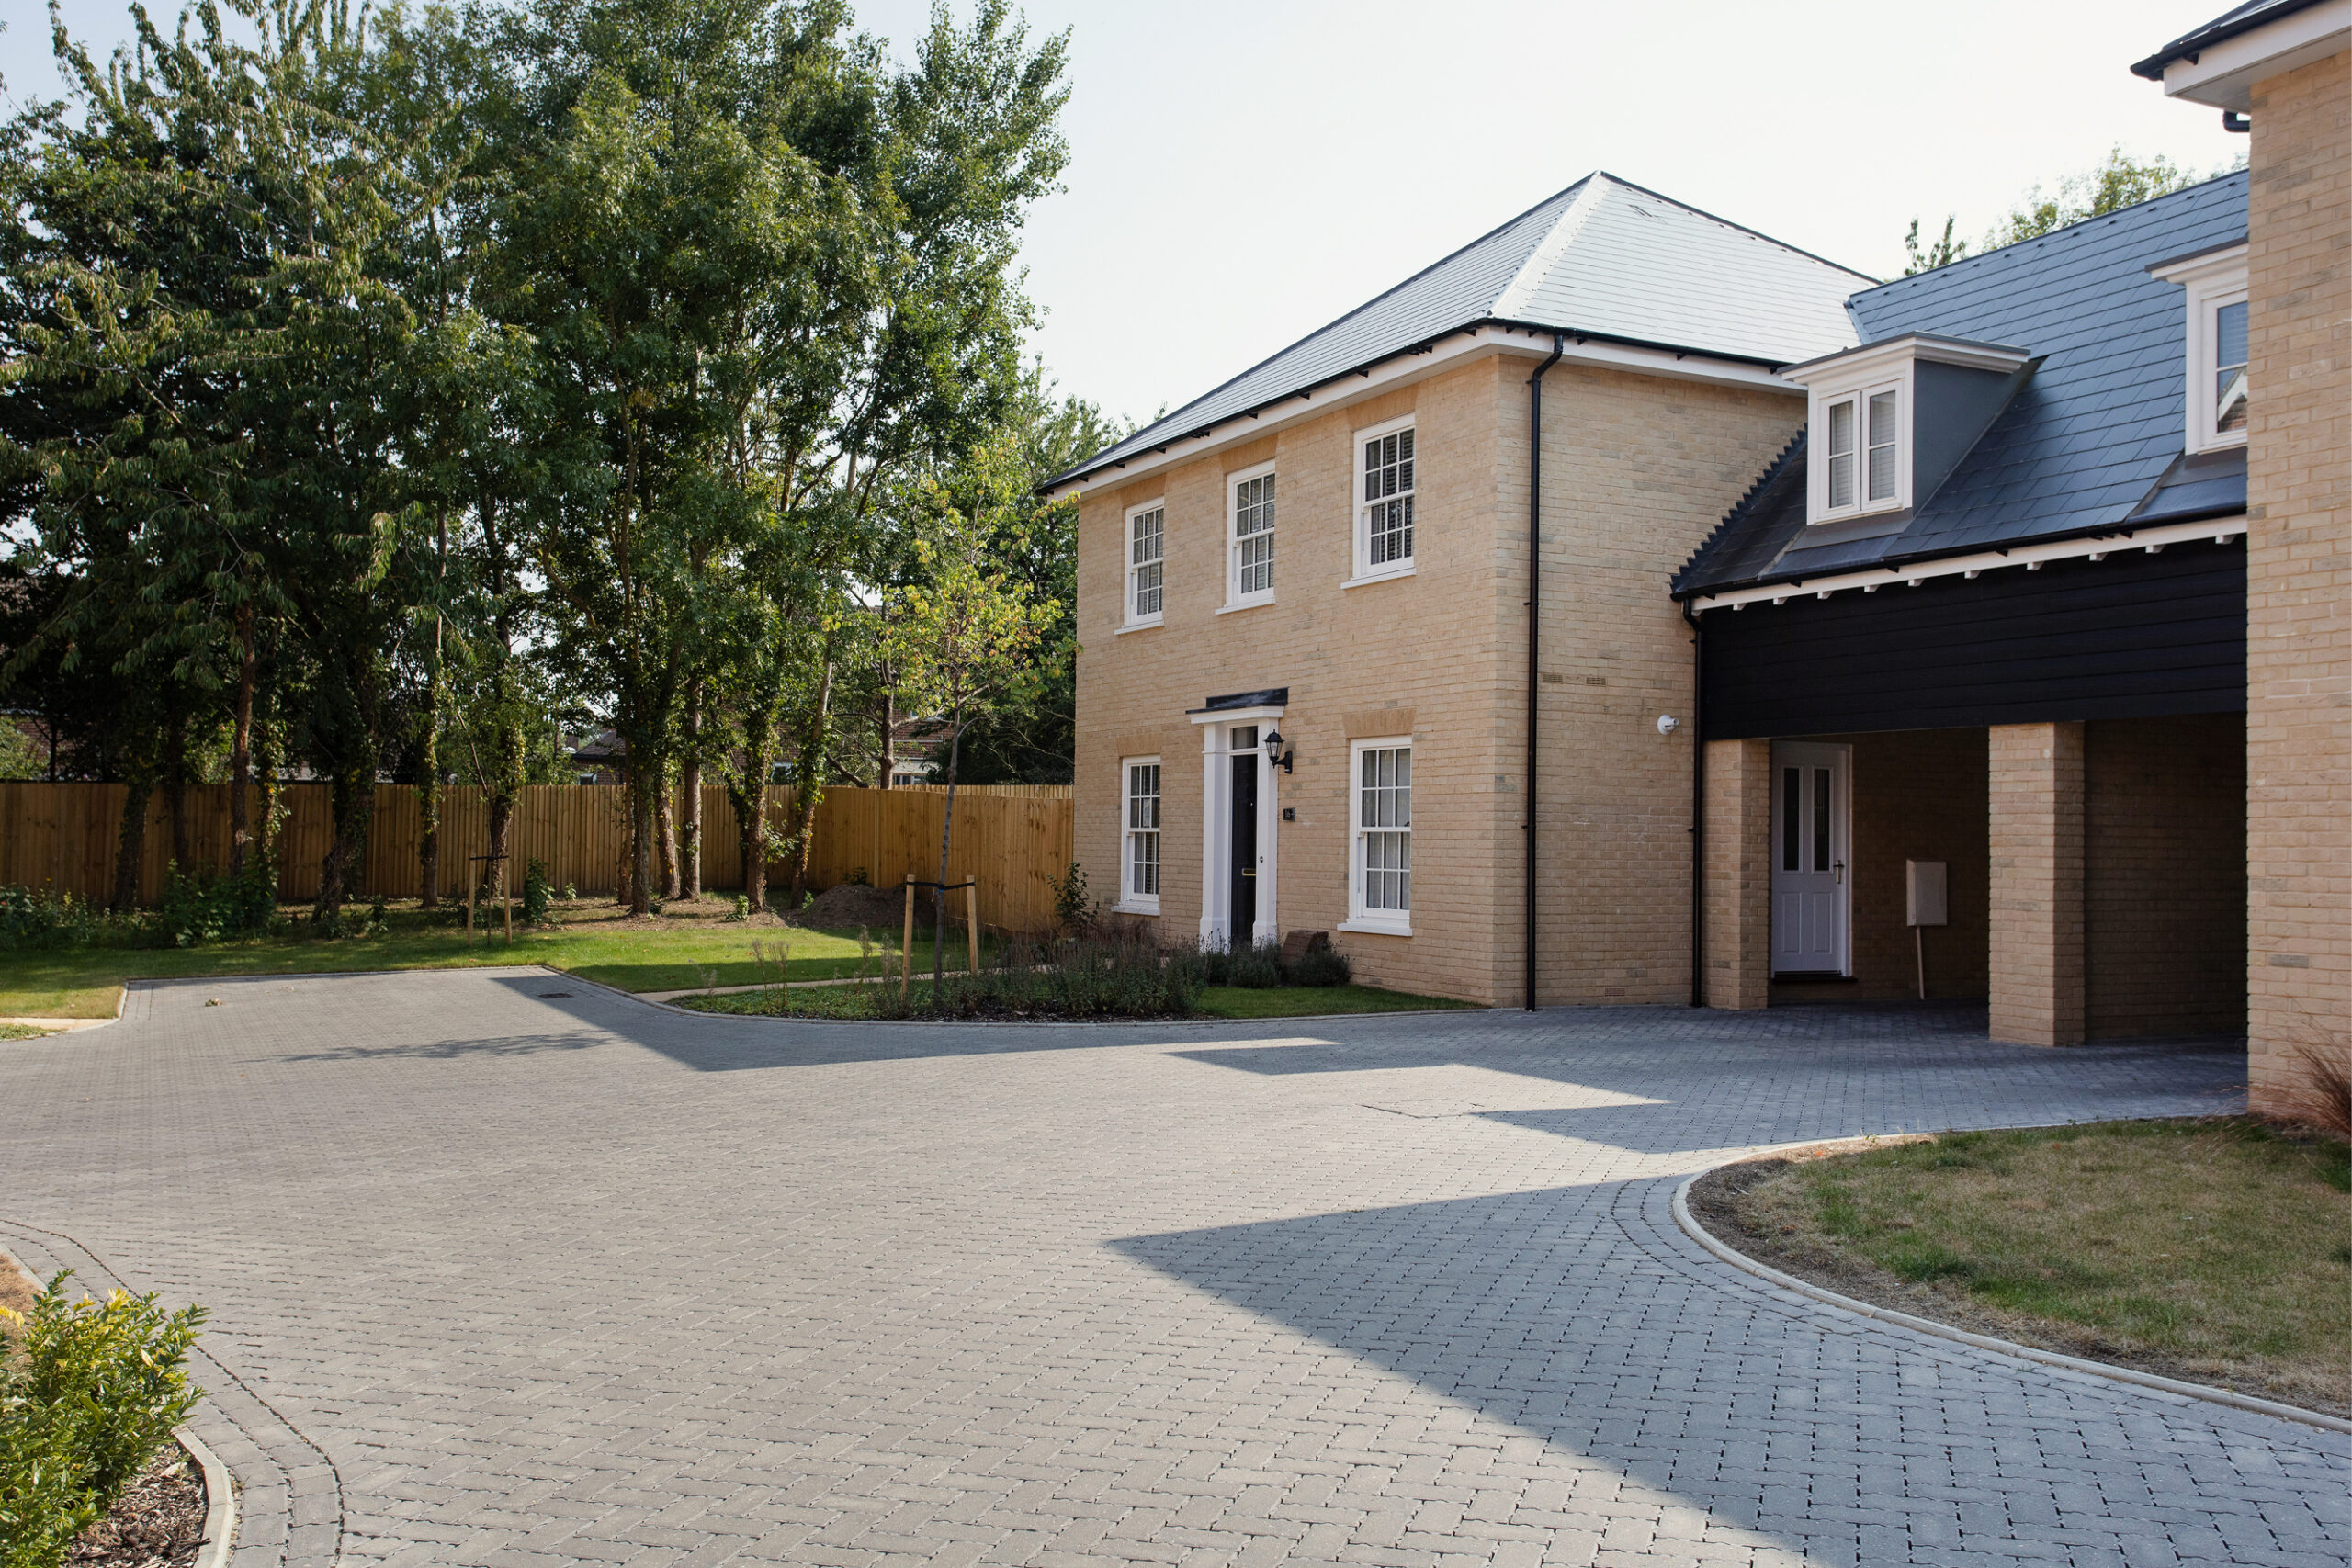 Willowbrook in Bramford Streetscene Landscape